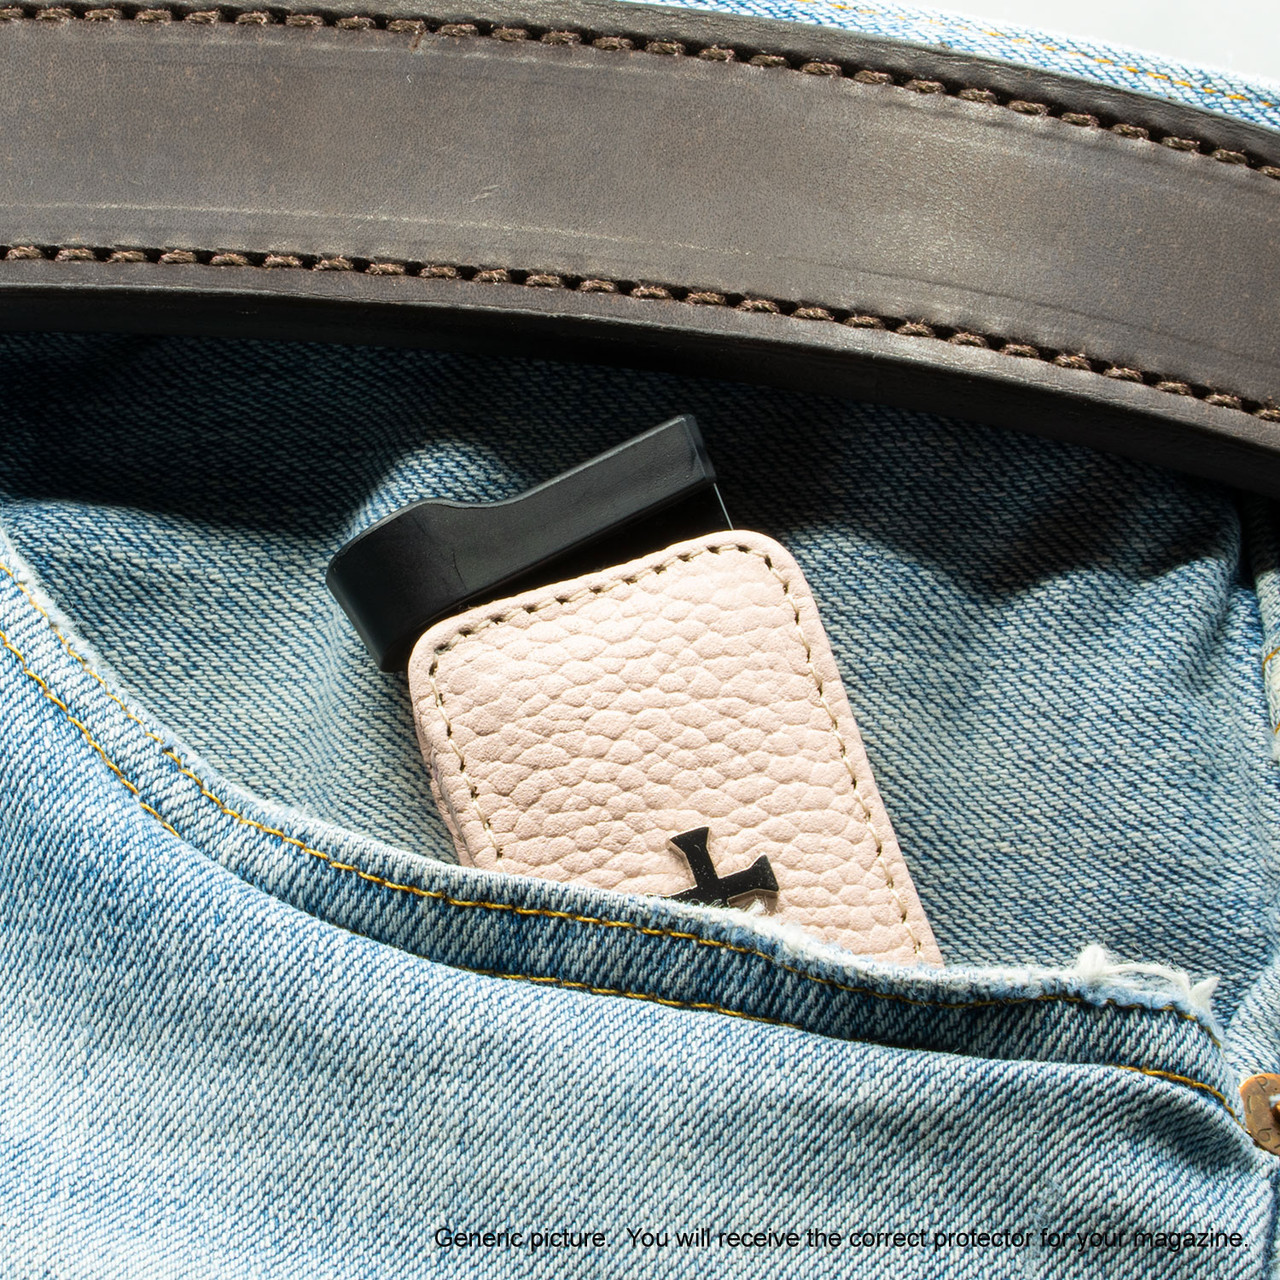 Sig Sauer P250 Compact Pink Carry Faithfully Cross Magazine Pocket Protector